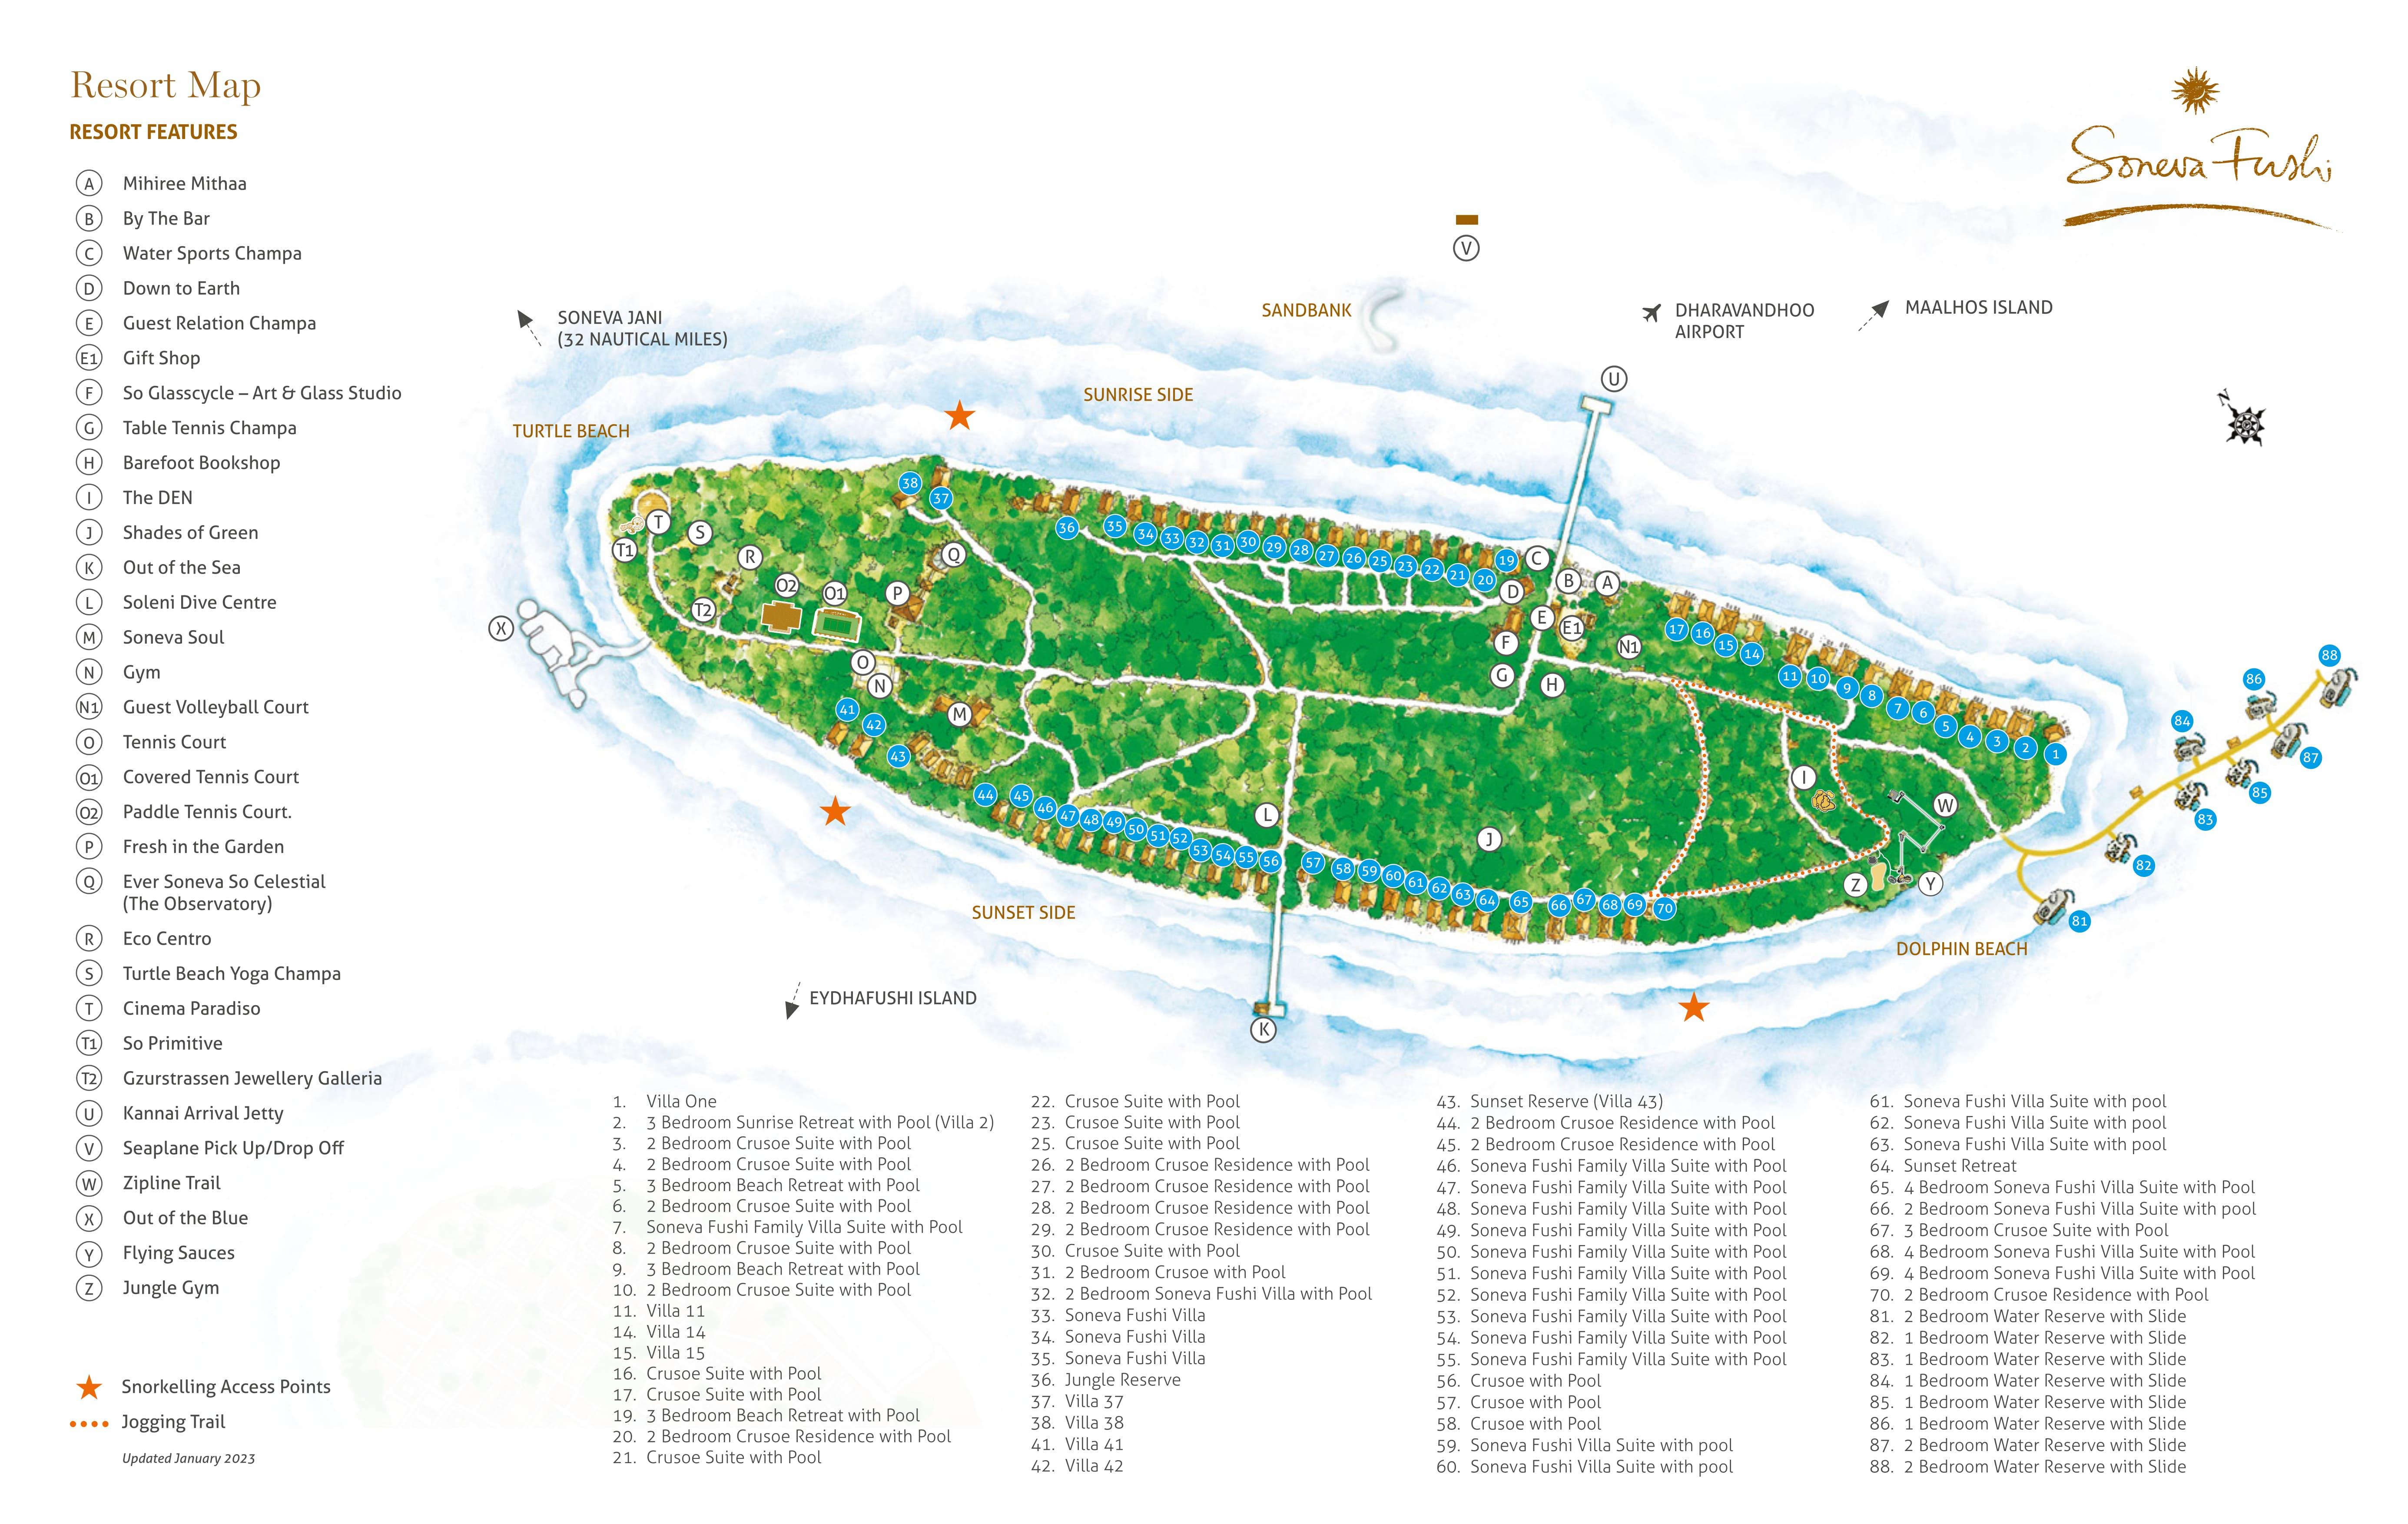 mappa Soneva Fushi Maldive, Map Maldives